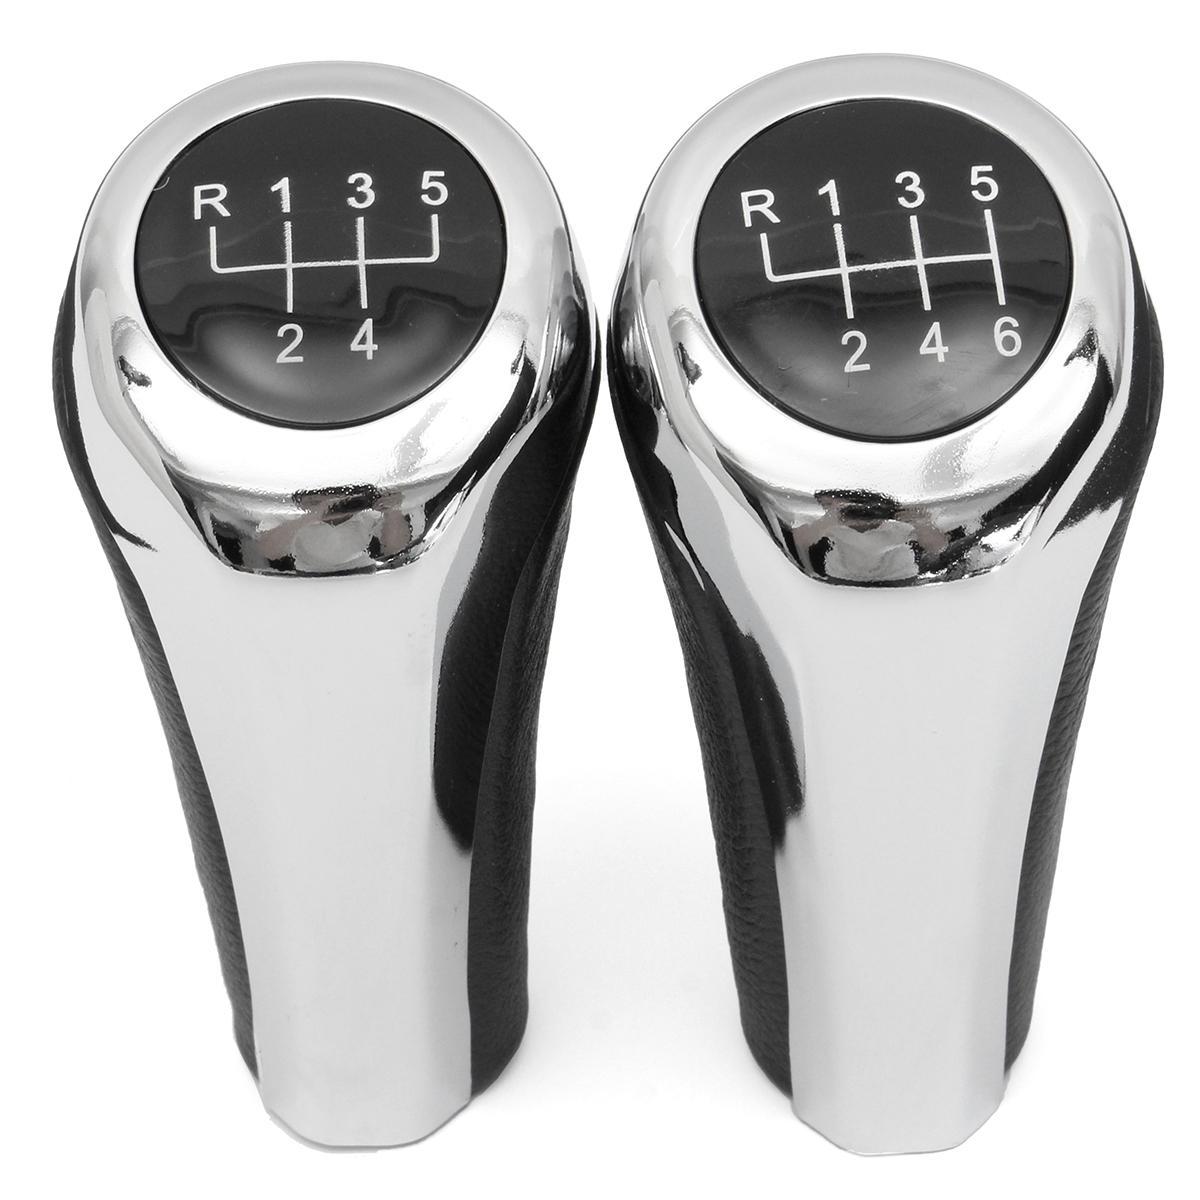 5 6 Speed Leather Chrome Aluminum Manual Gear Shift Knob For BMW E82 E90 E91 E60 E63 E83 E84 E53, Banggood  - buy with discount